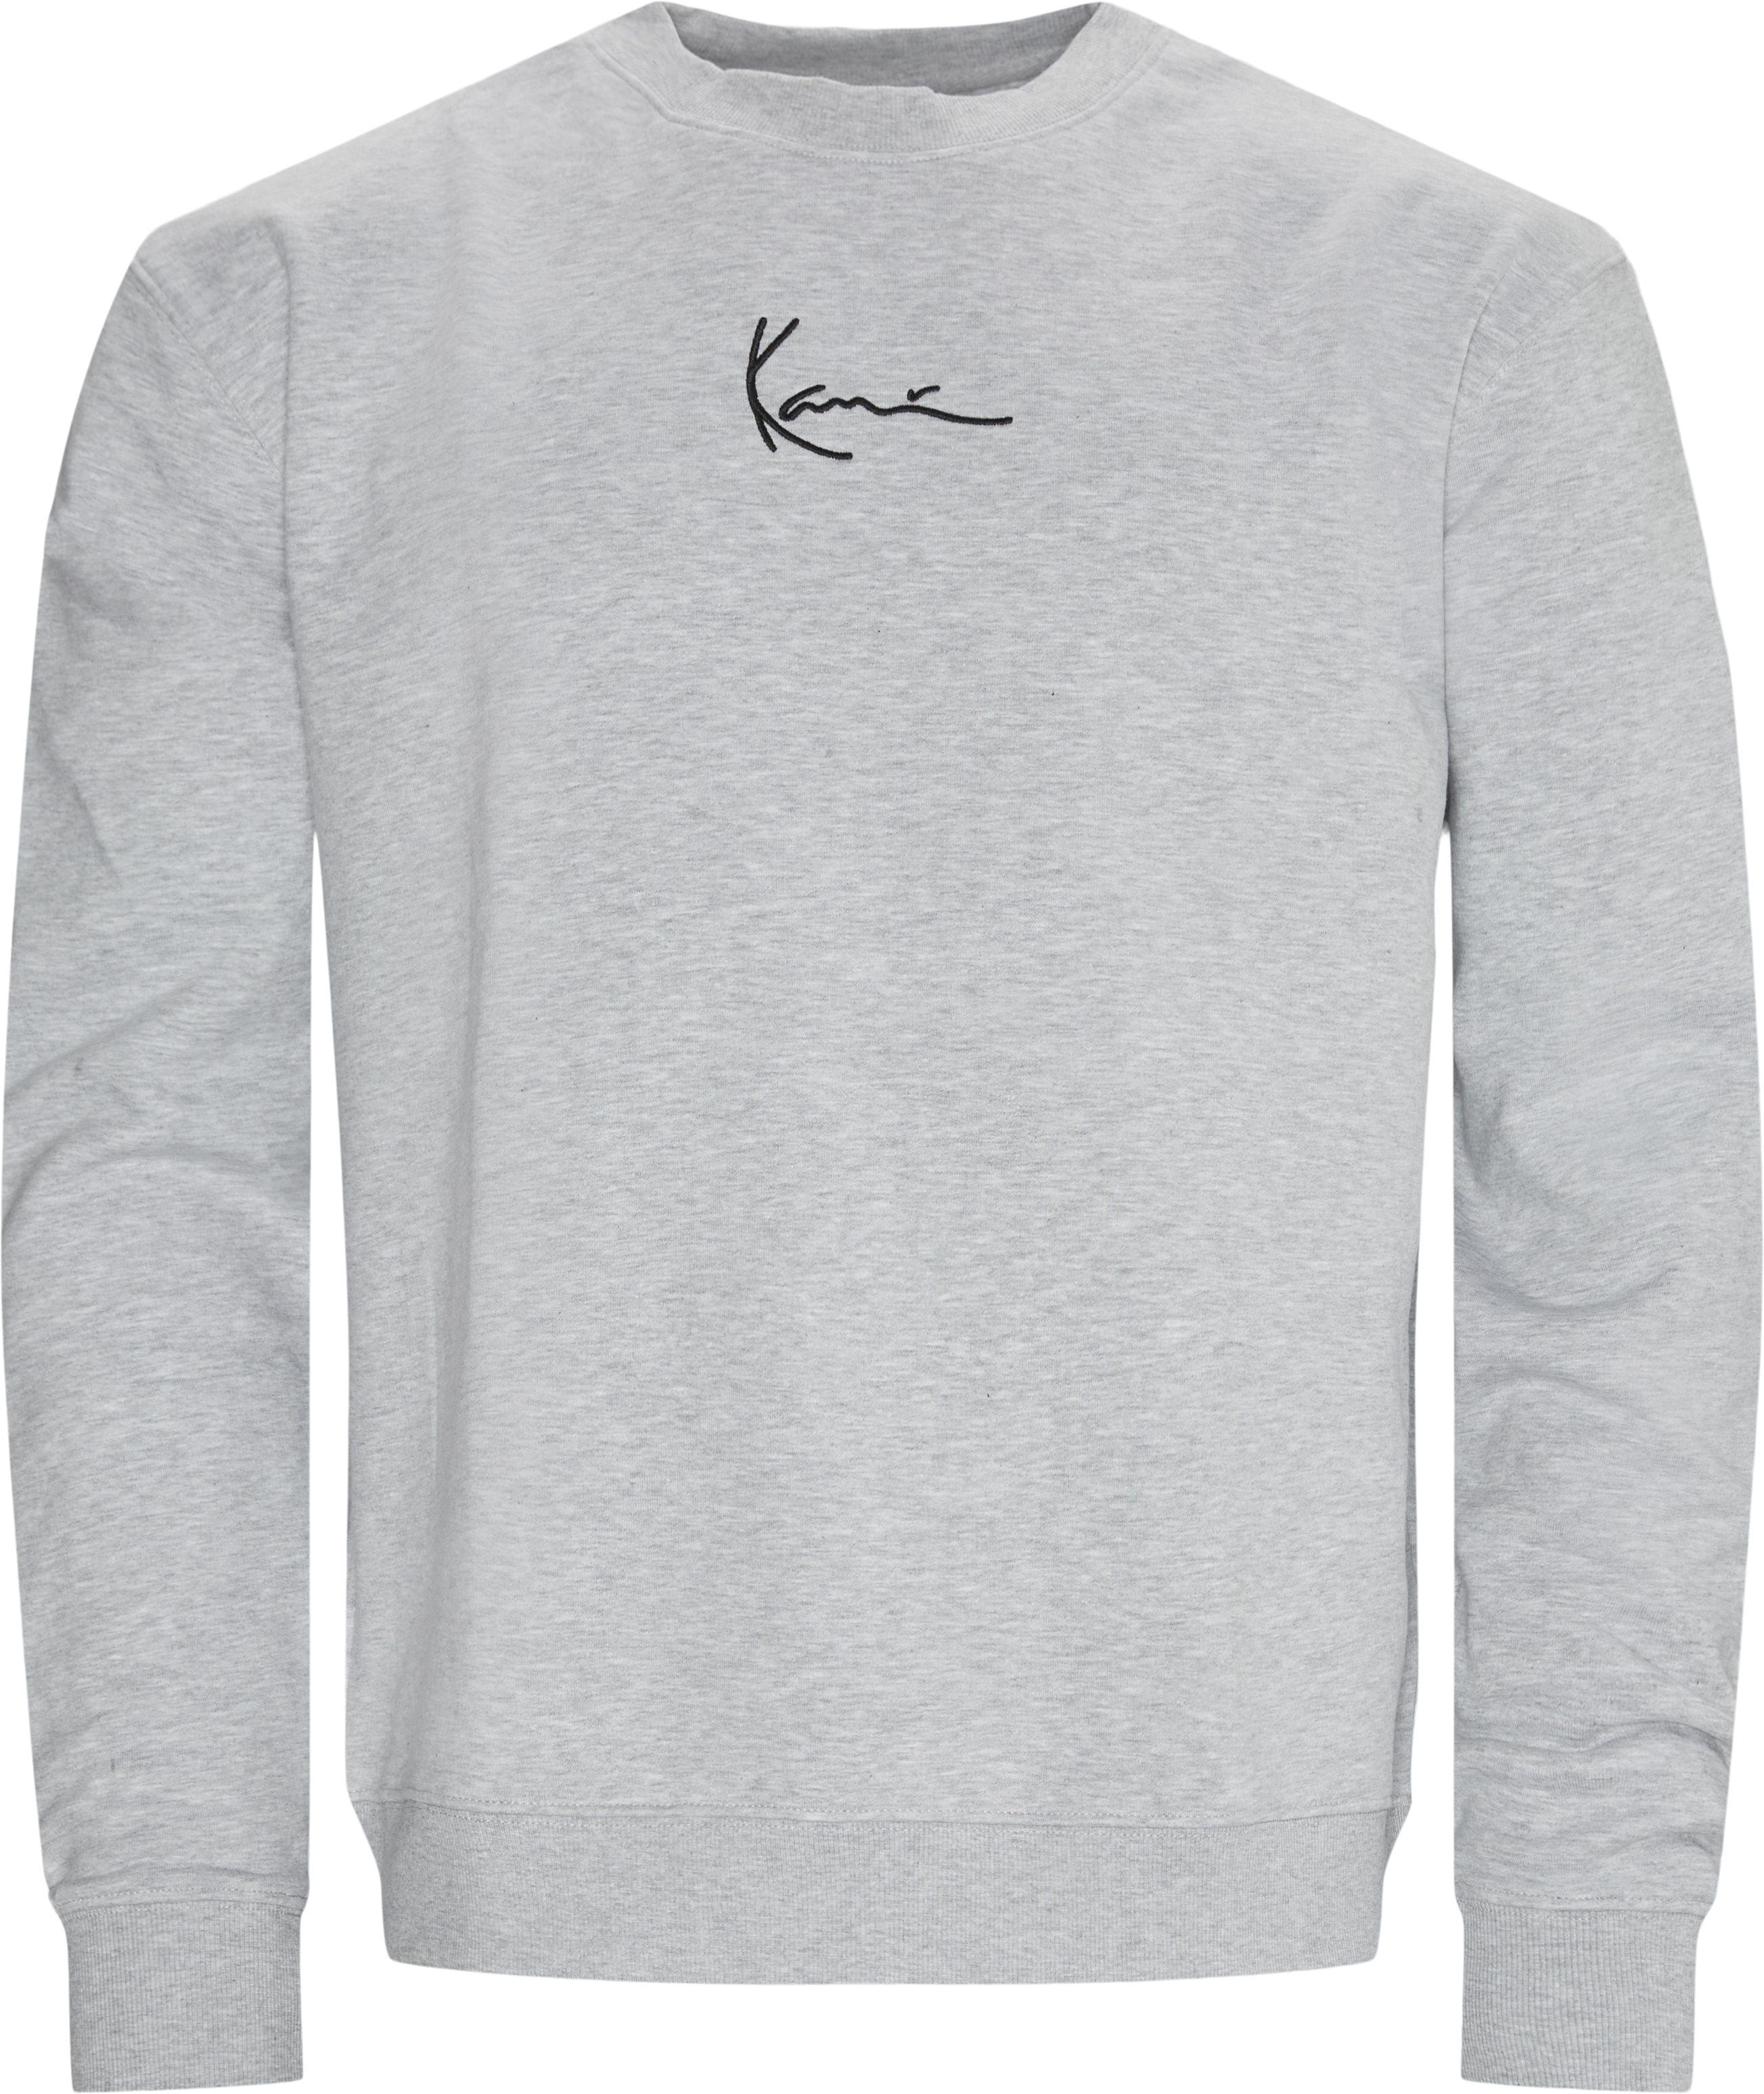 Signature Crewneck Sweatshirt - Sweatshirts - Regular - Grå